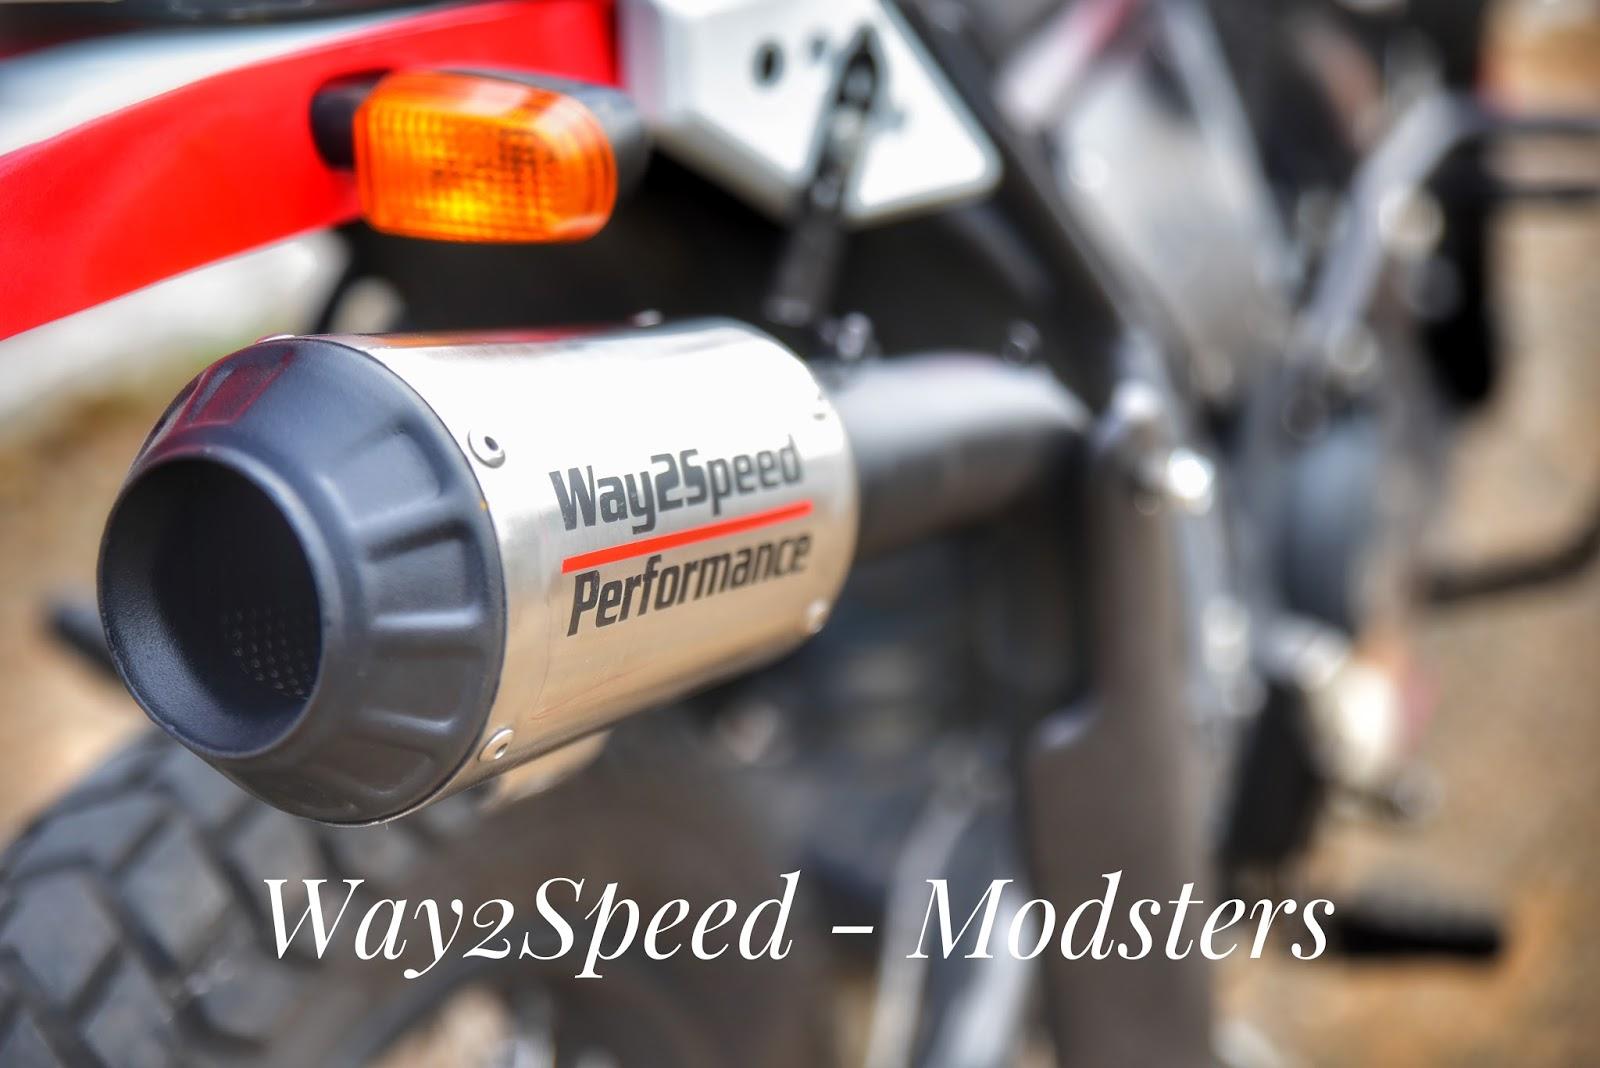 way2speed-Royal-enfield-himalayan-custom-04